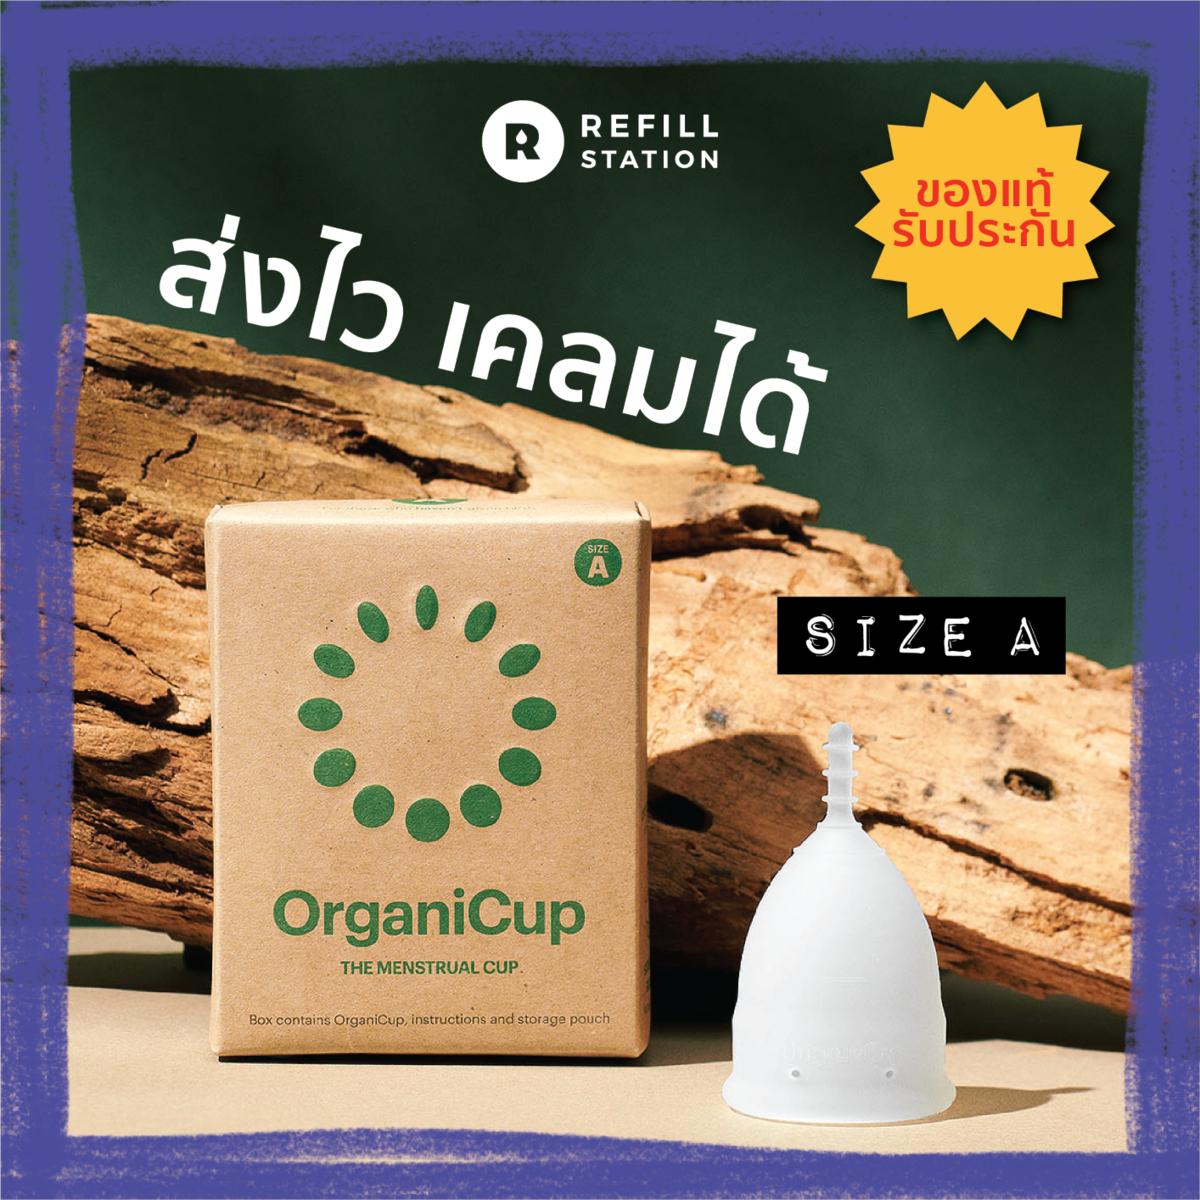 Refill Station - ถ้วยอนามัย Menstrual Cup OrganiCup สำหรับช่วงมีประจำเดือน Size A